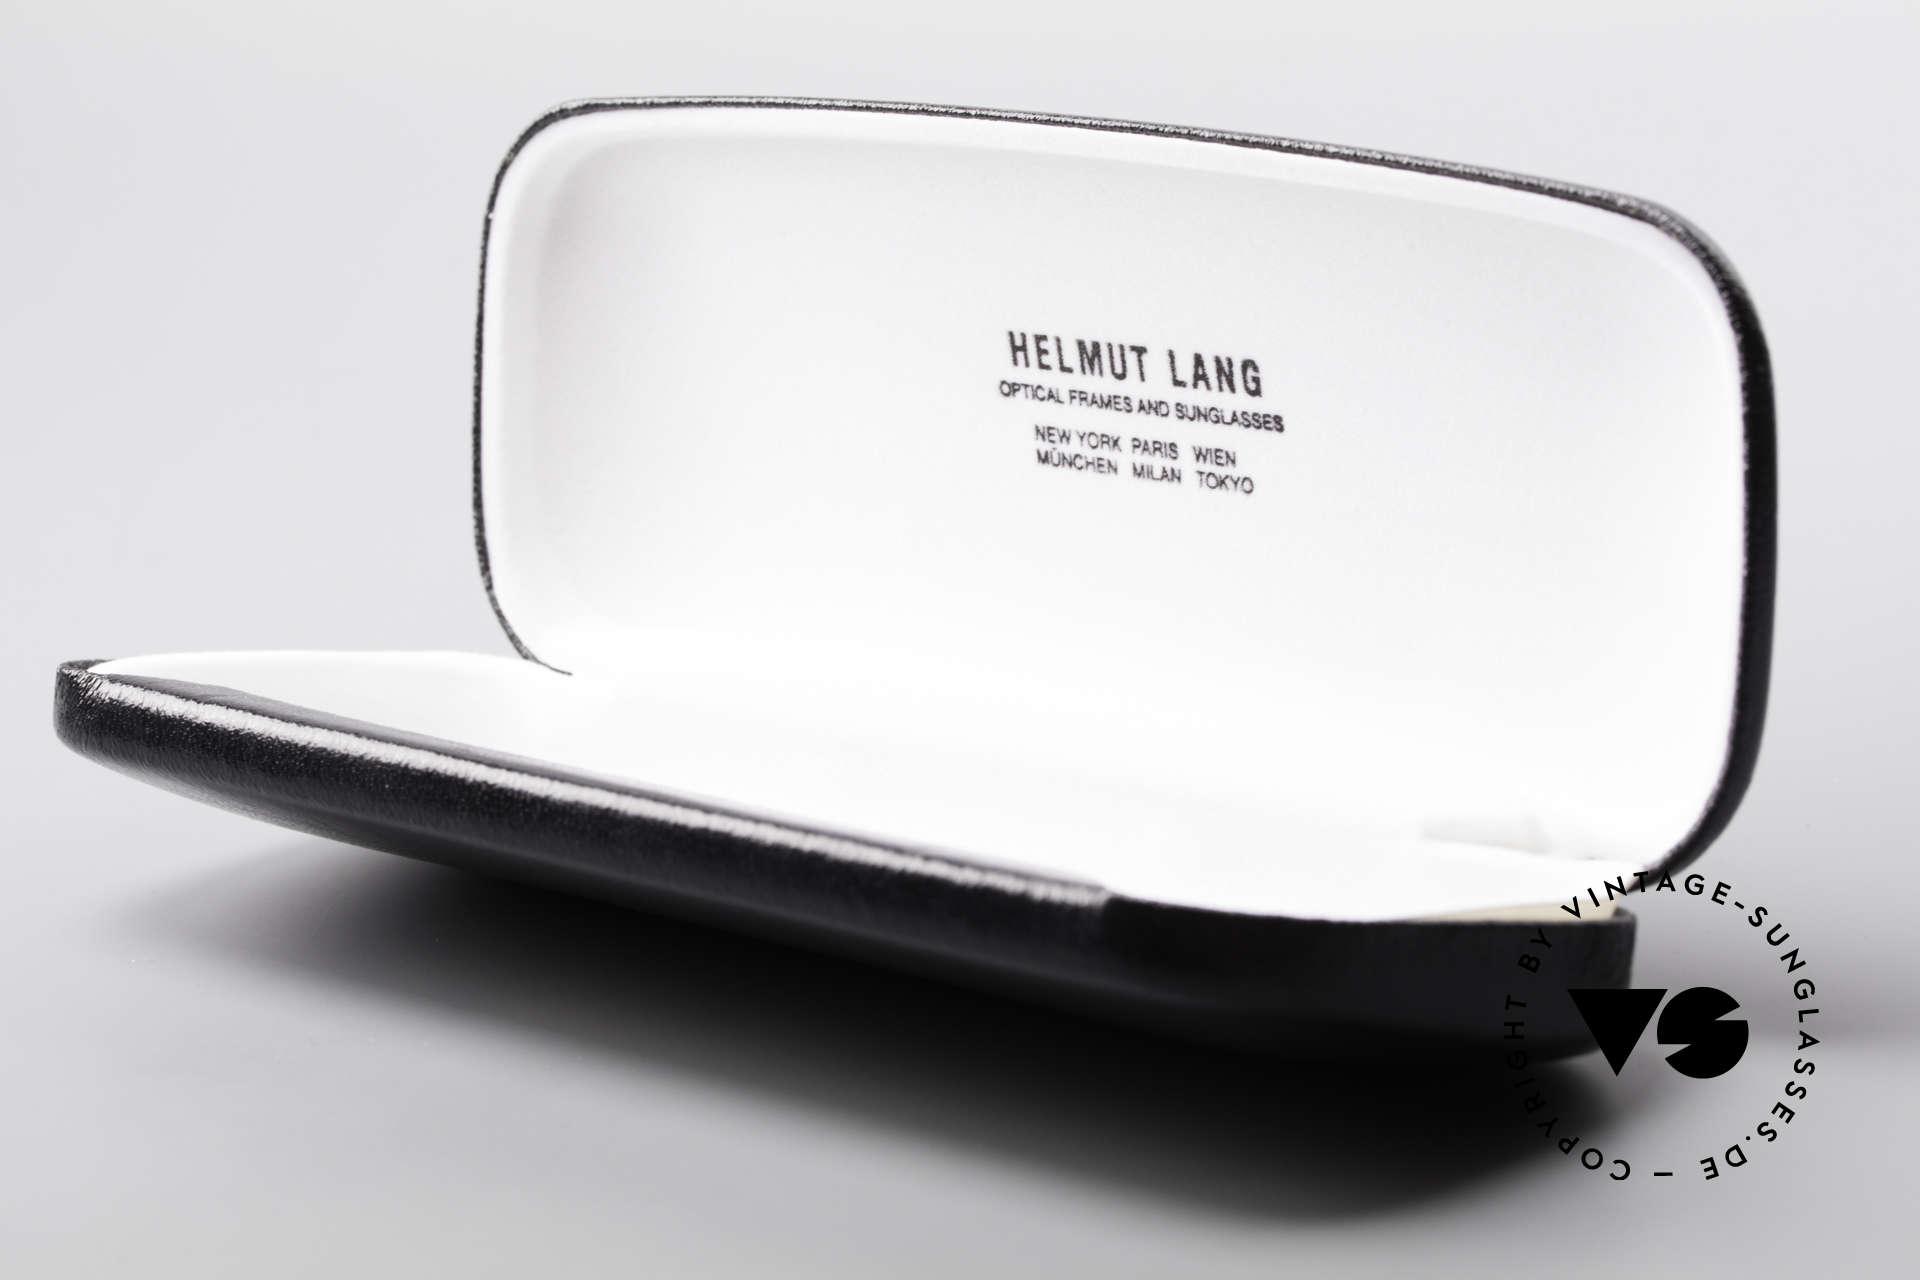 Helmut Lang 21-0006 Titanium Sunglasses Timeless, Size: medium, Made for Men